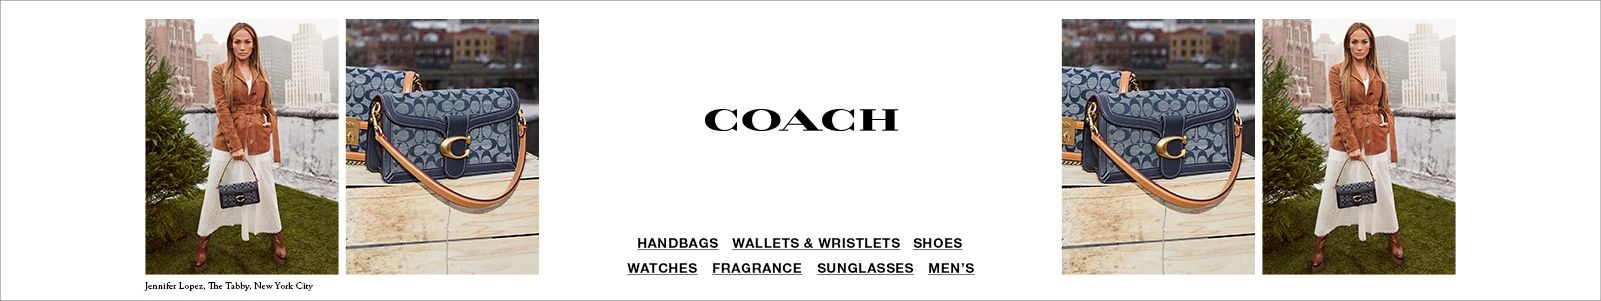 Coach, Handbags, Wallets and Wristlets, Shoes, Watches, Fragrance, Sunglasses, Men's